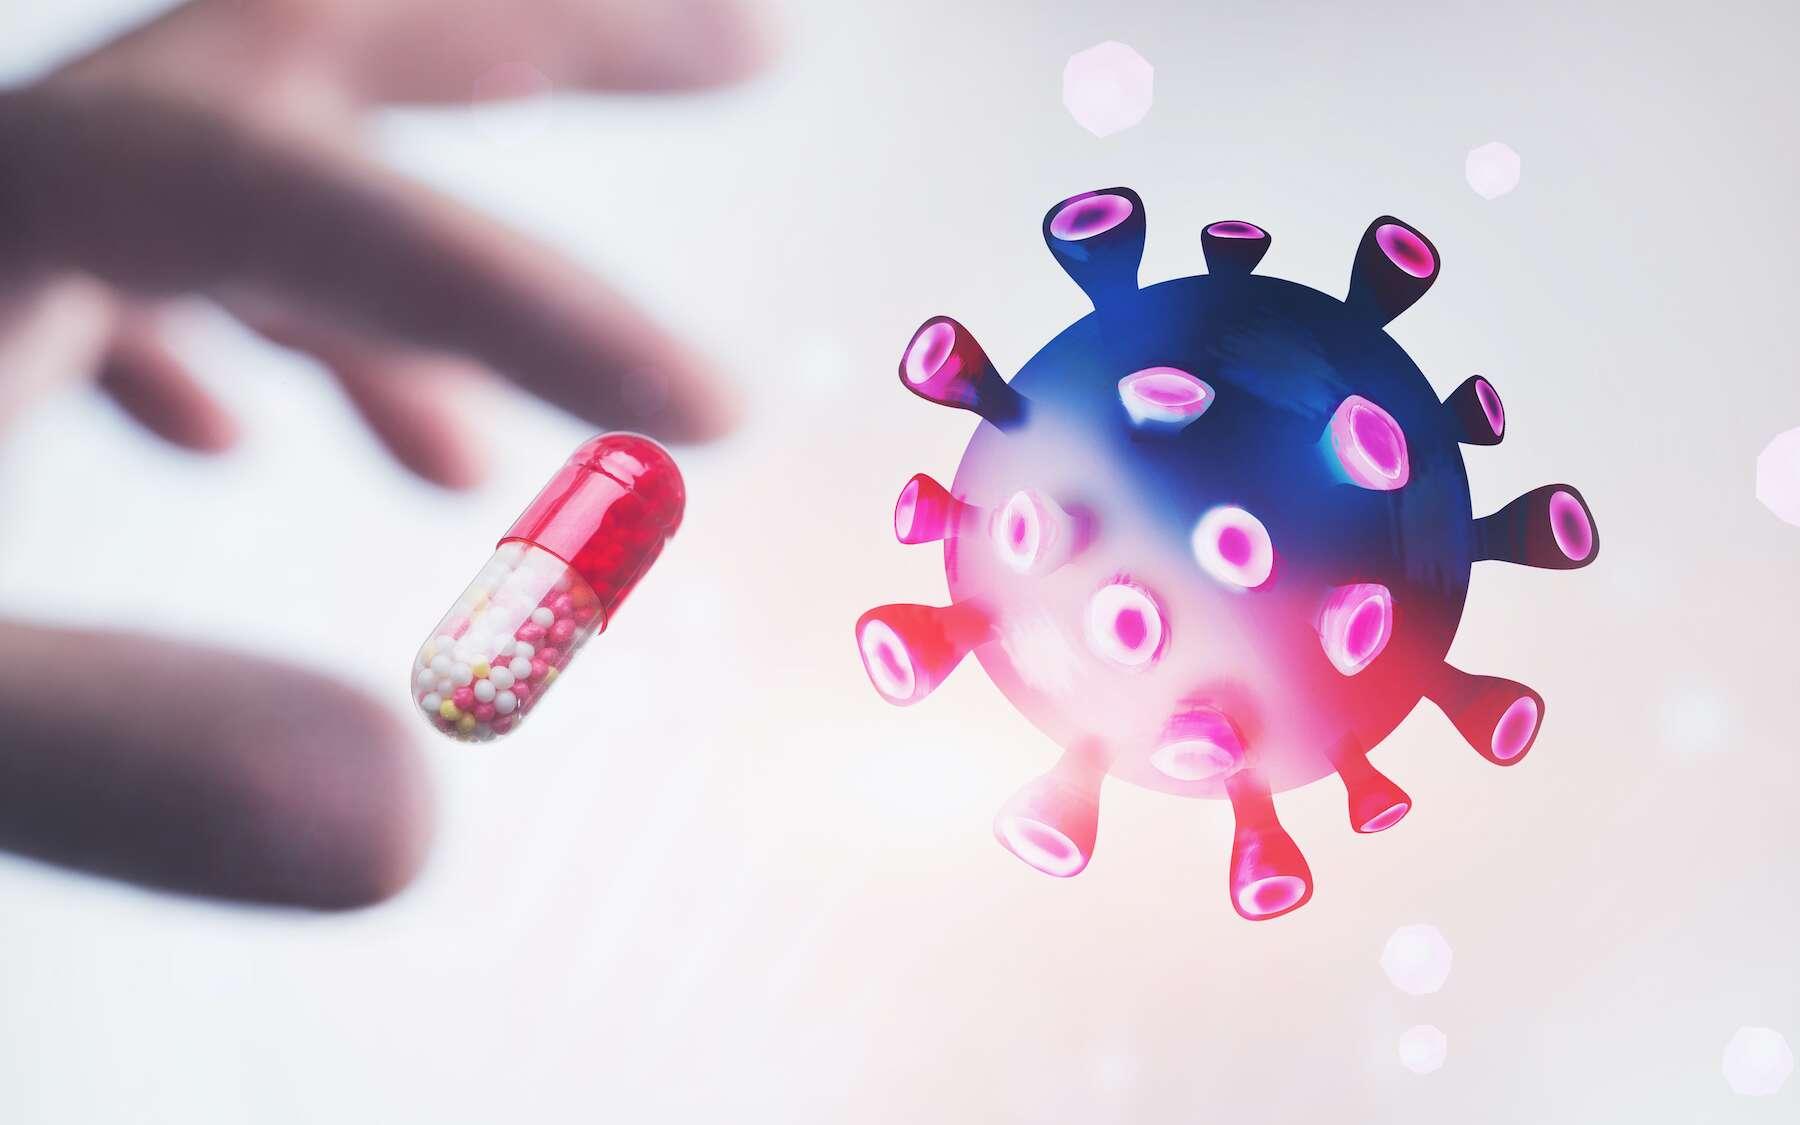 Se vacciner contre le coronavirus sera-t-il bientôt aussi simple que de prendre une pilule ? © denisismagilov, Adobe Stock